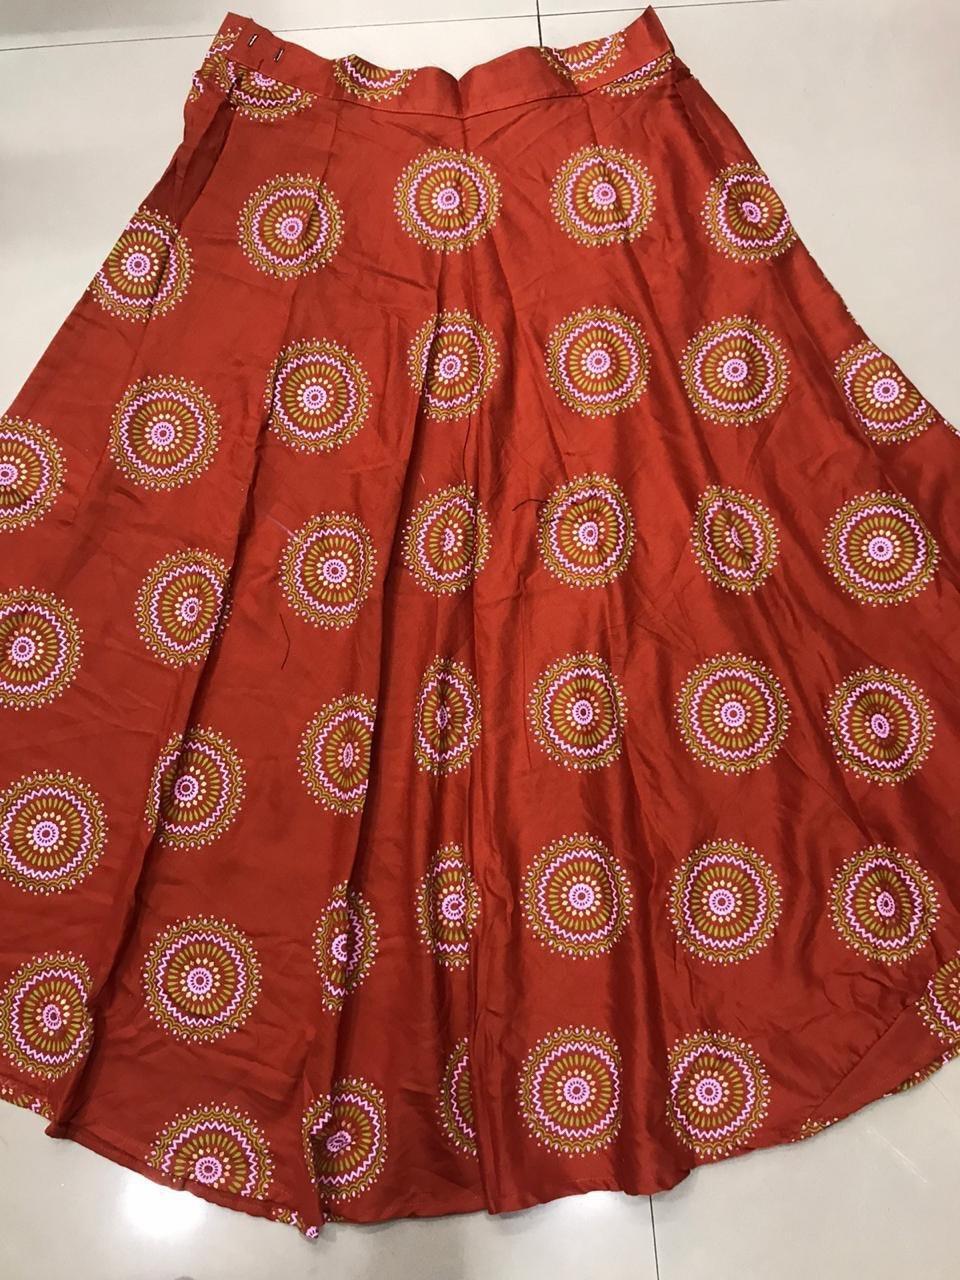 Ladies Ethnic Top with skirt